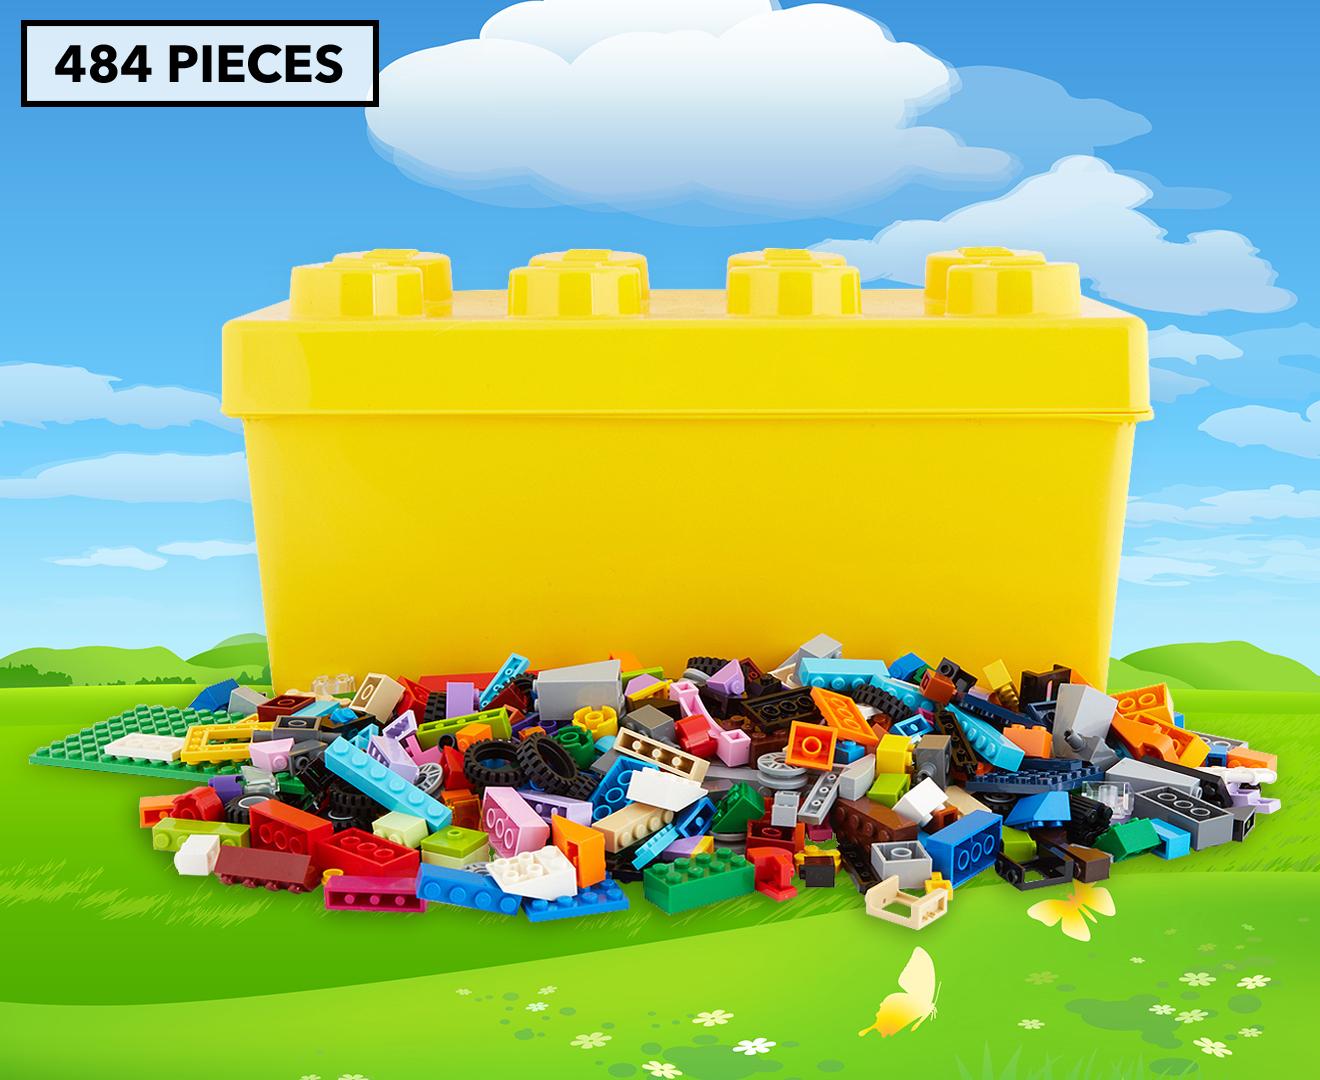 Lego Classic Medium Creative Brick Box Instructions